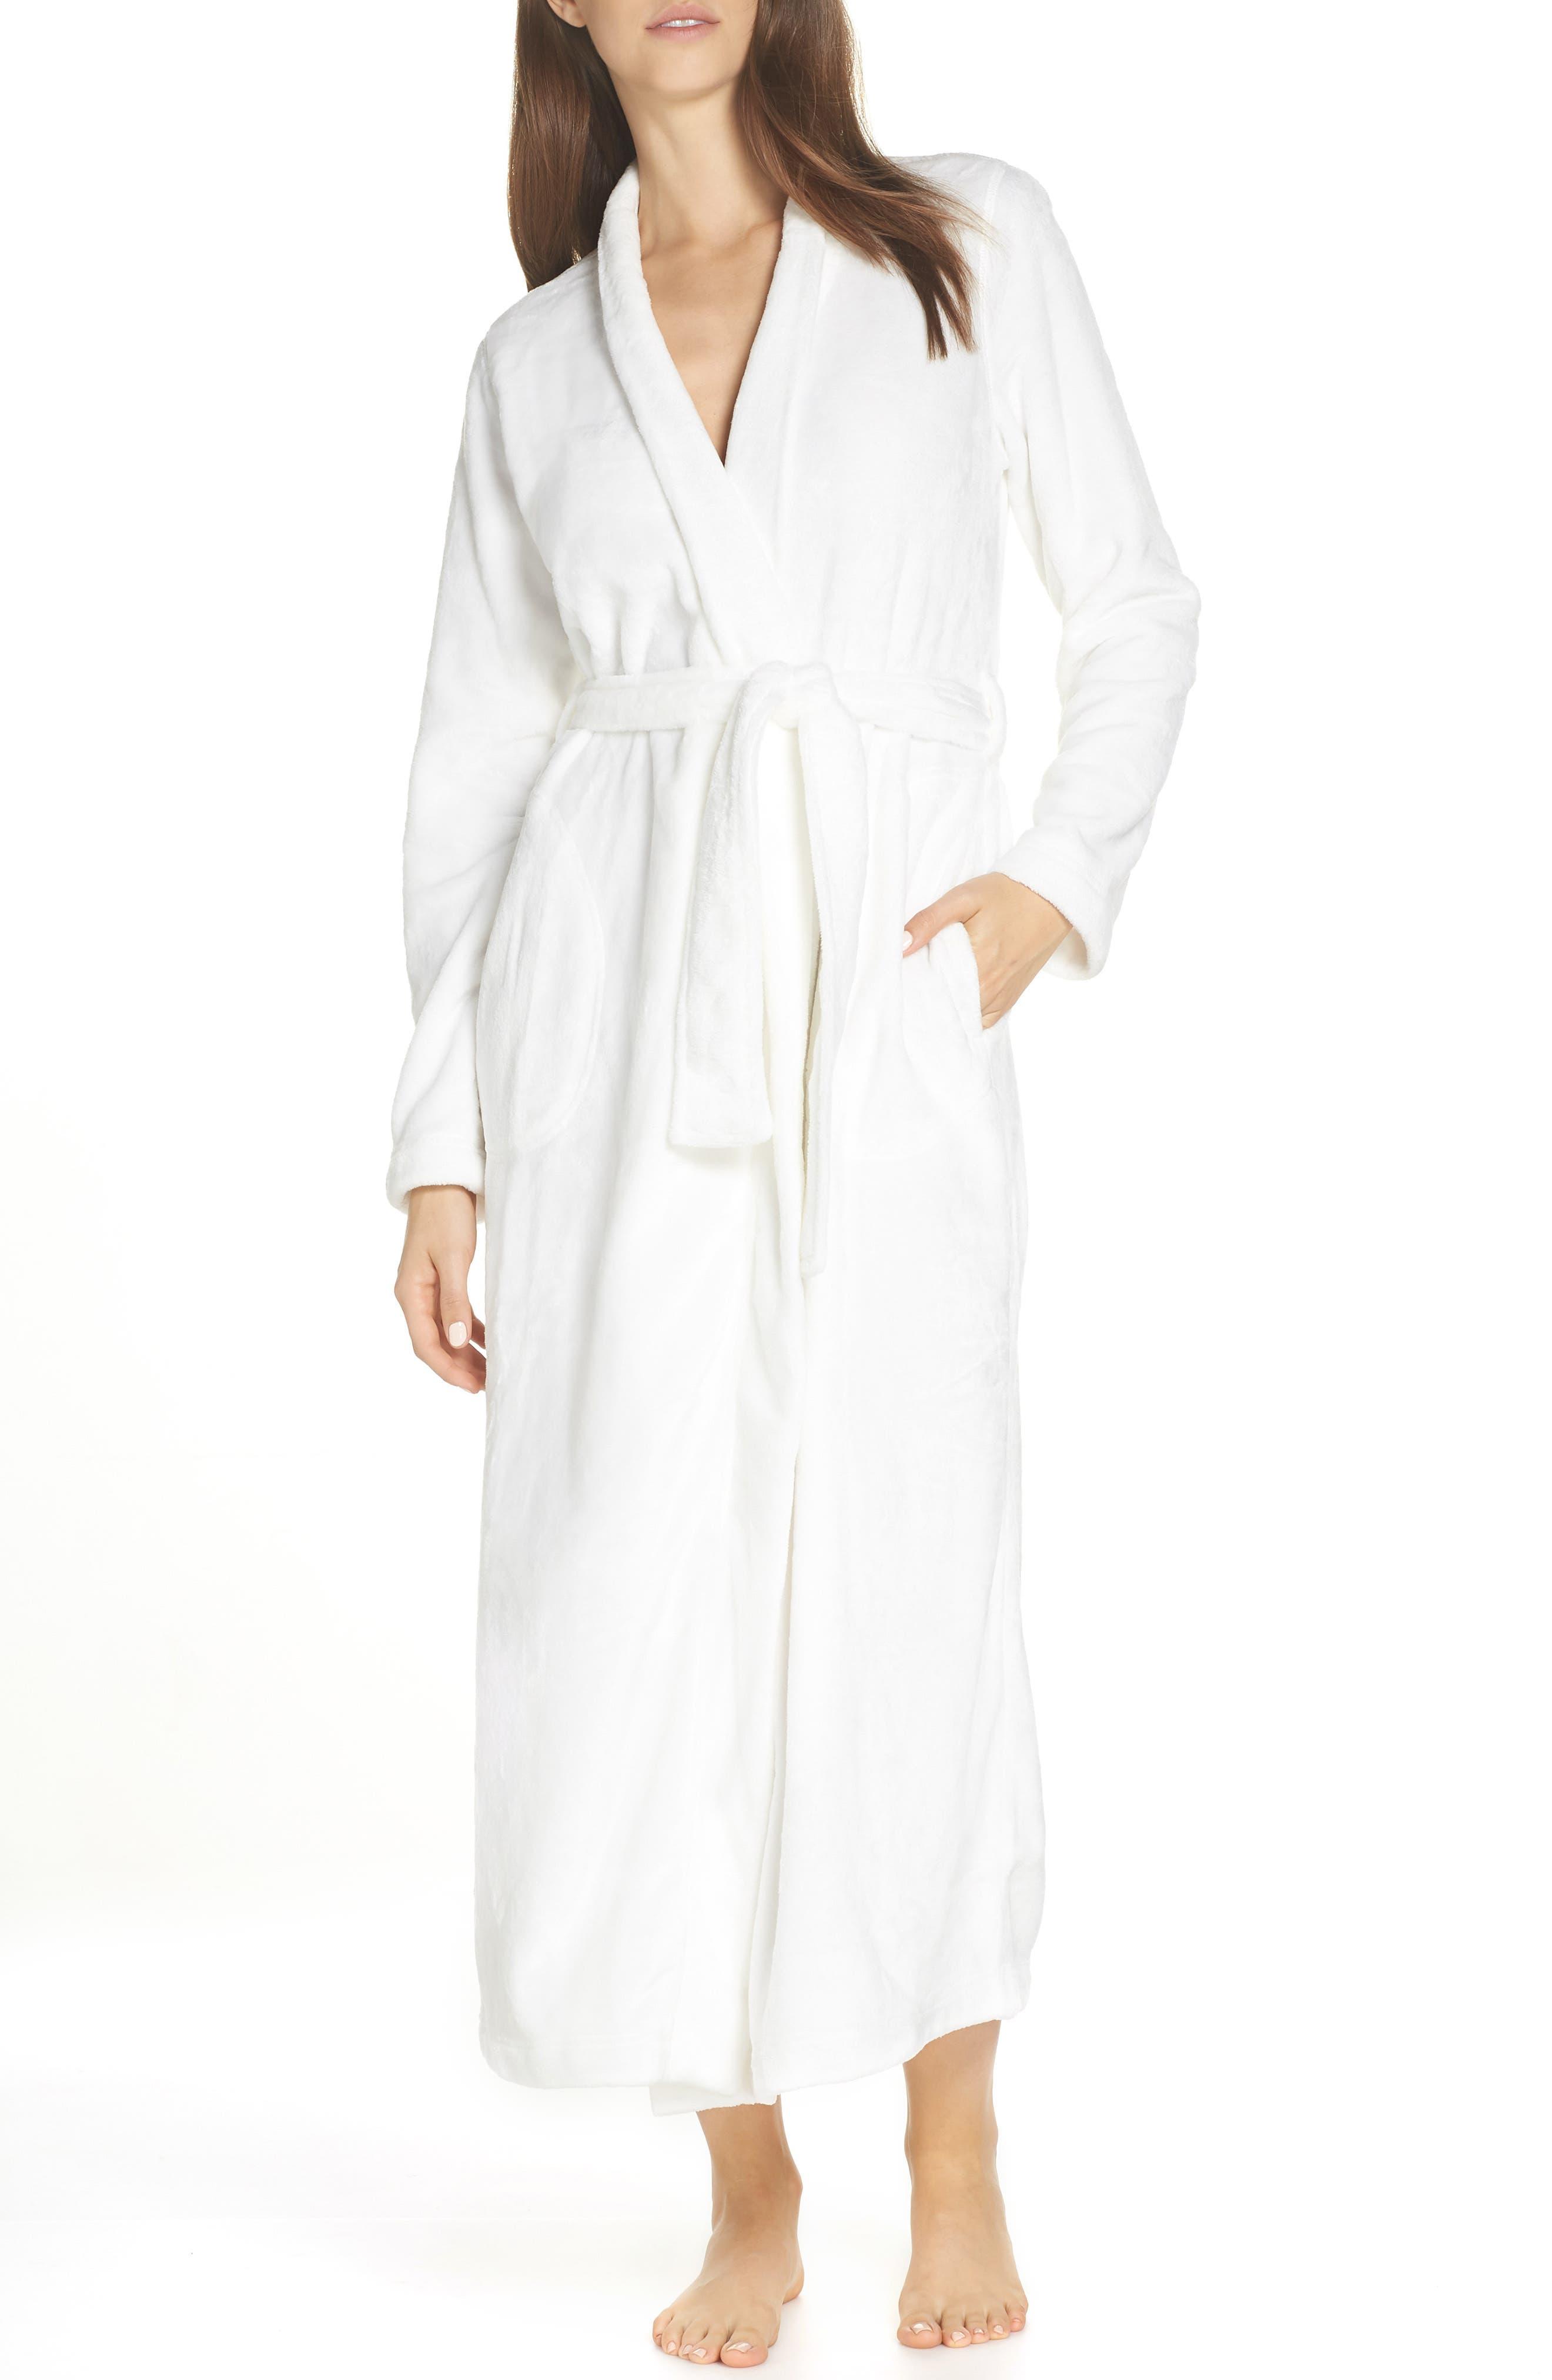 UGG<SUP>®</SUP> Marlow Double-Face Fleece Robe, Main, color, SEAGULL